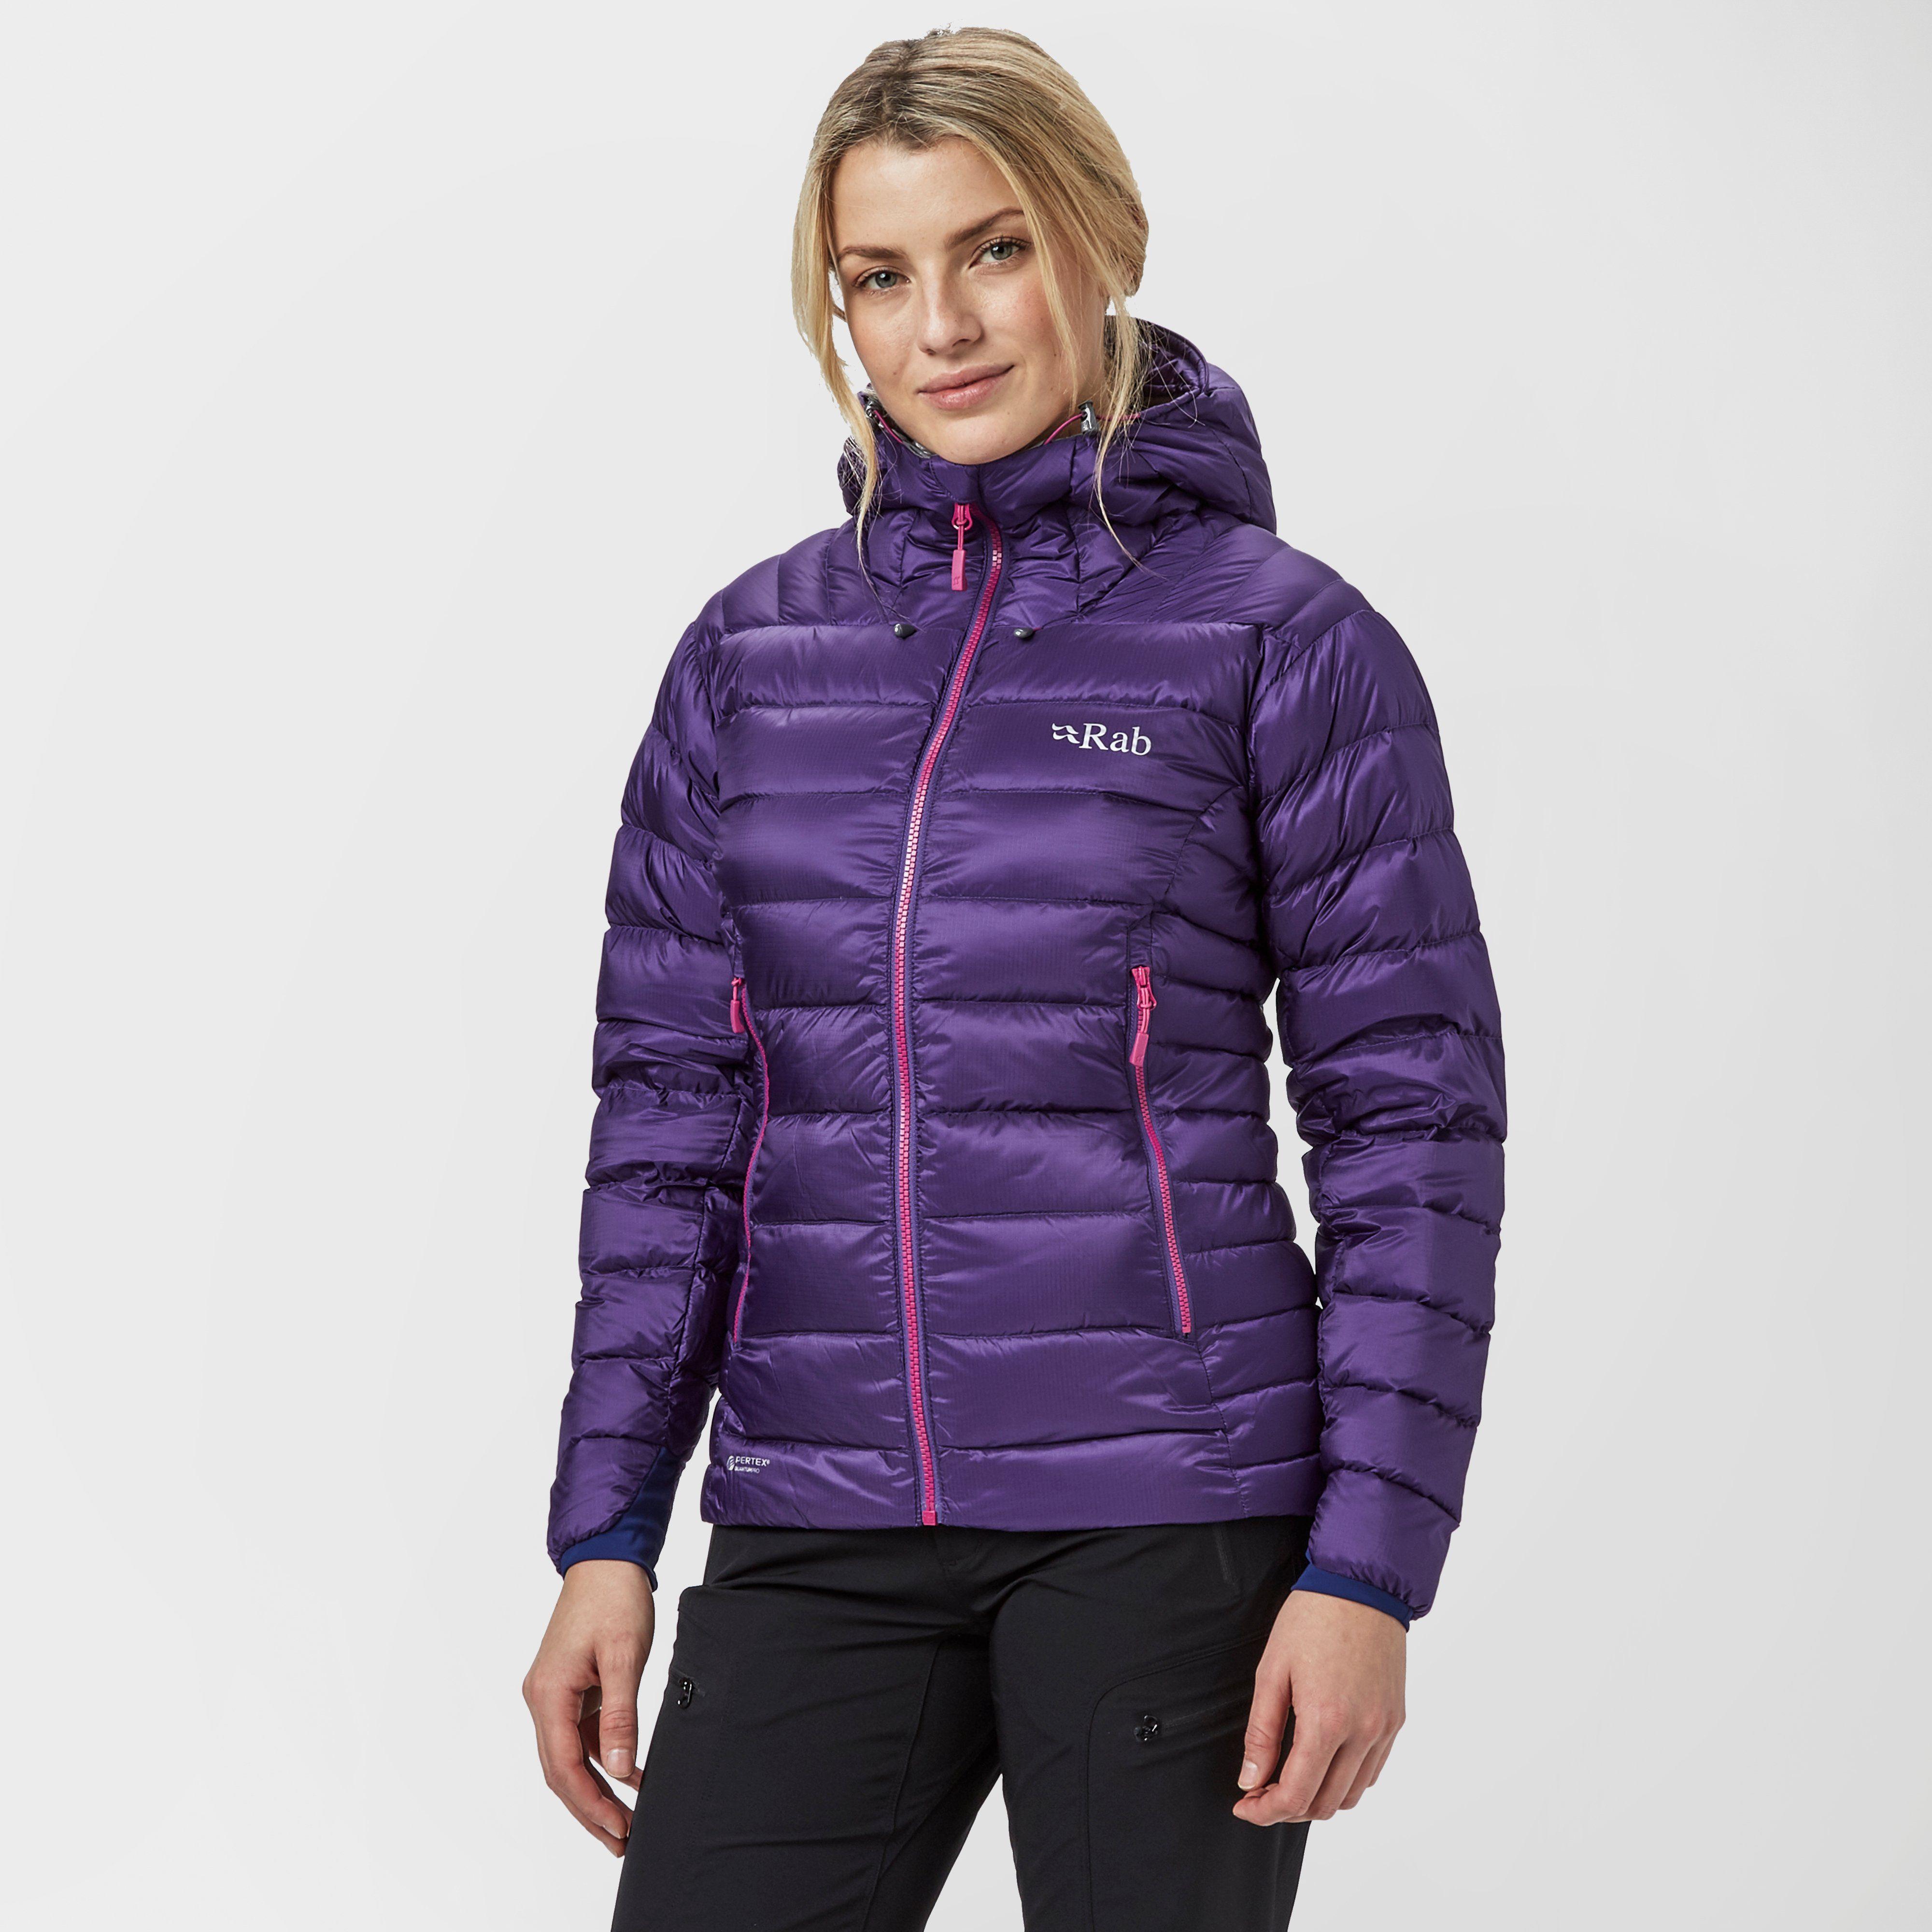 RAB Women's Electron Jacket